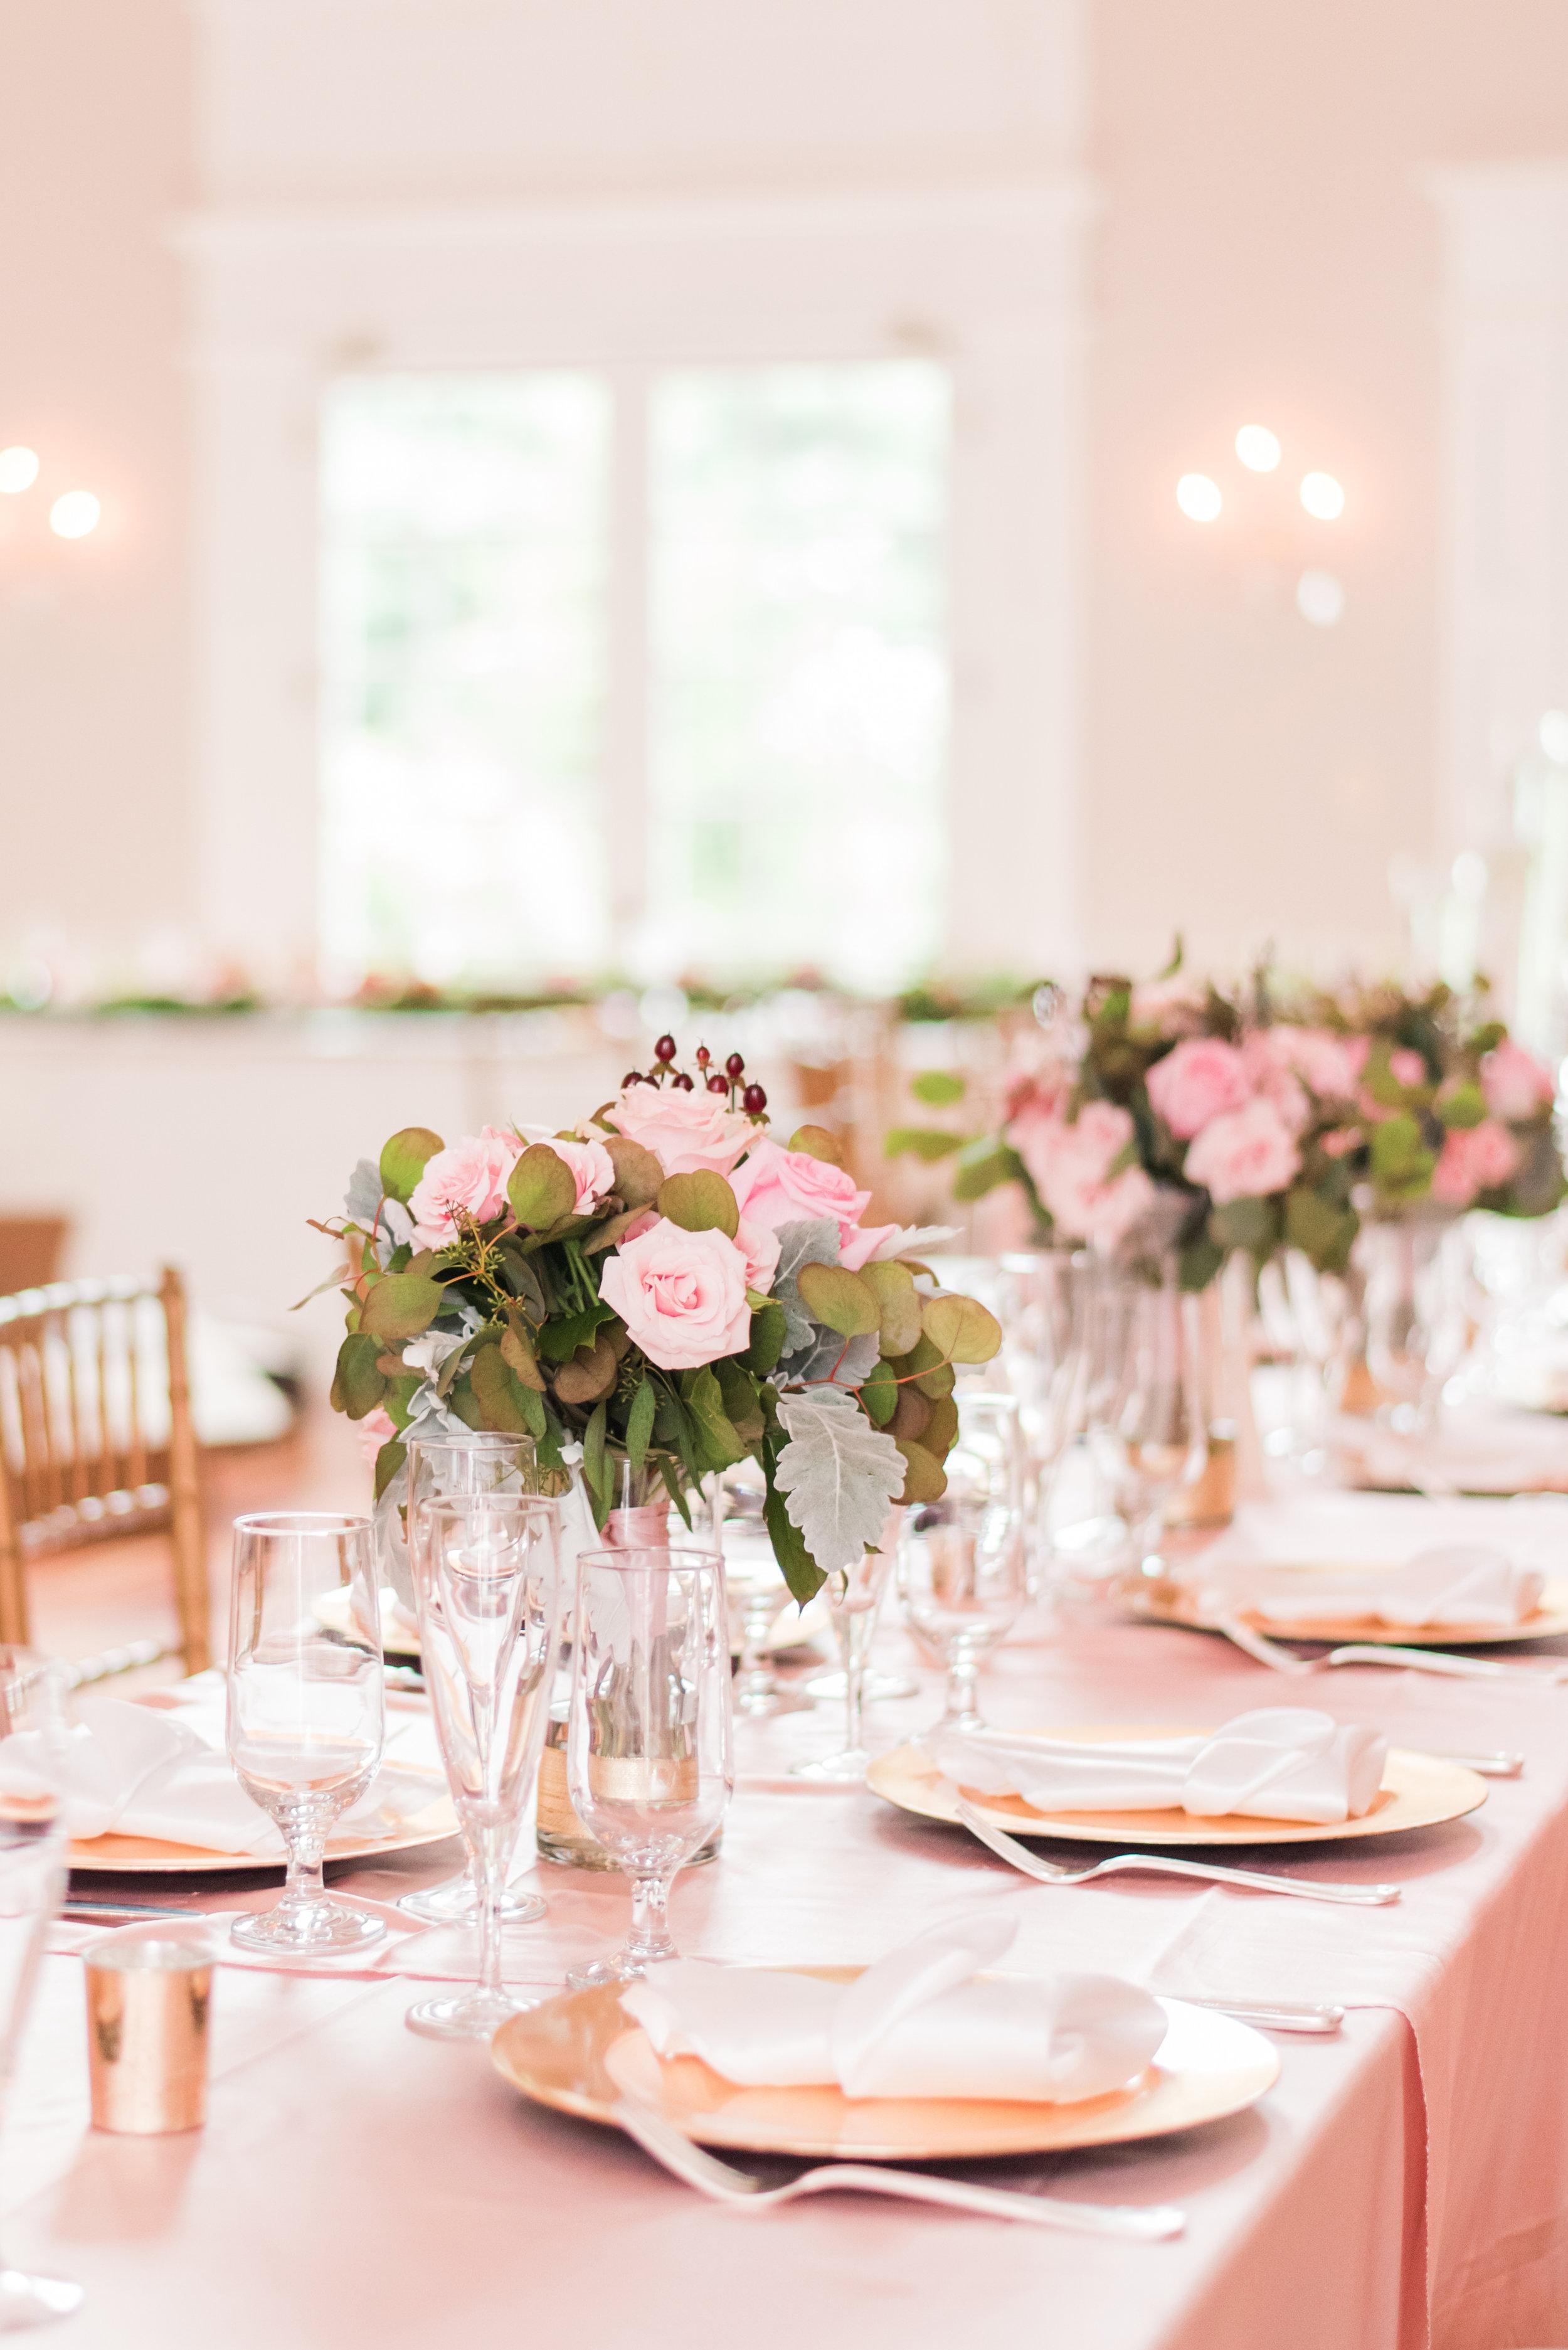 ROSE_HILL_MANOR_WEDDING_K+S_JOFFOTO-13.jpg